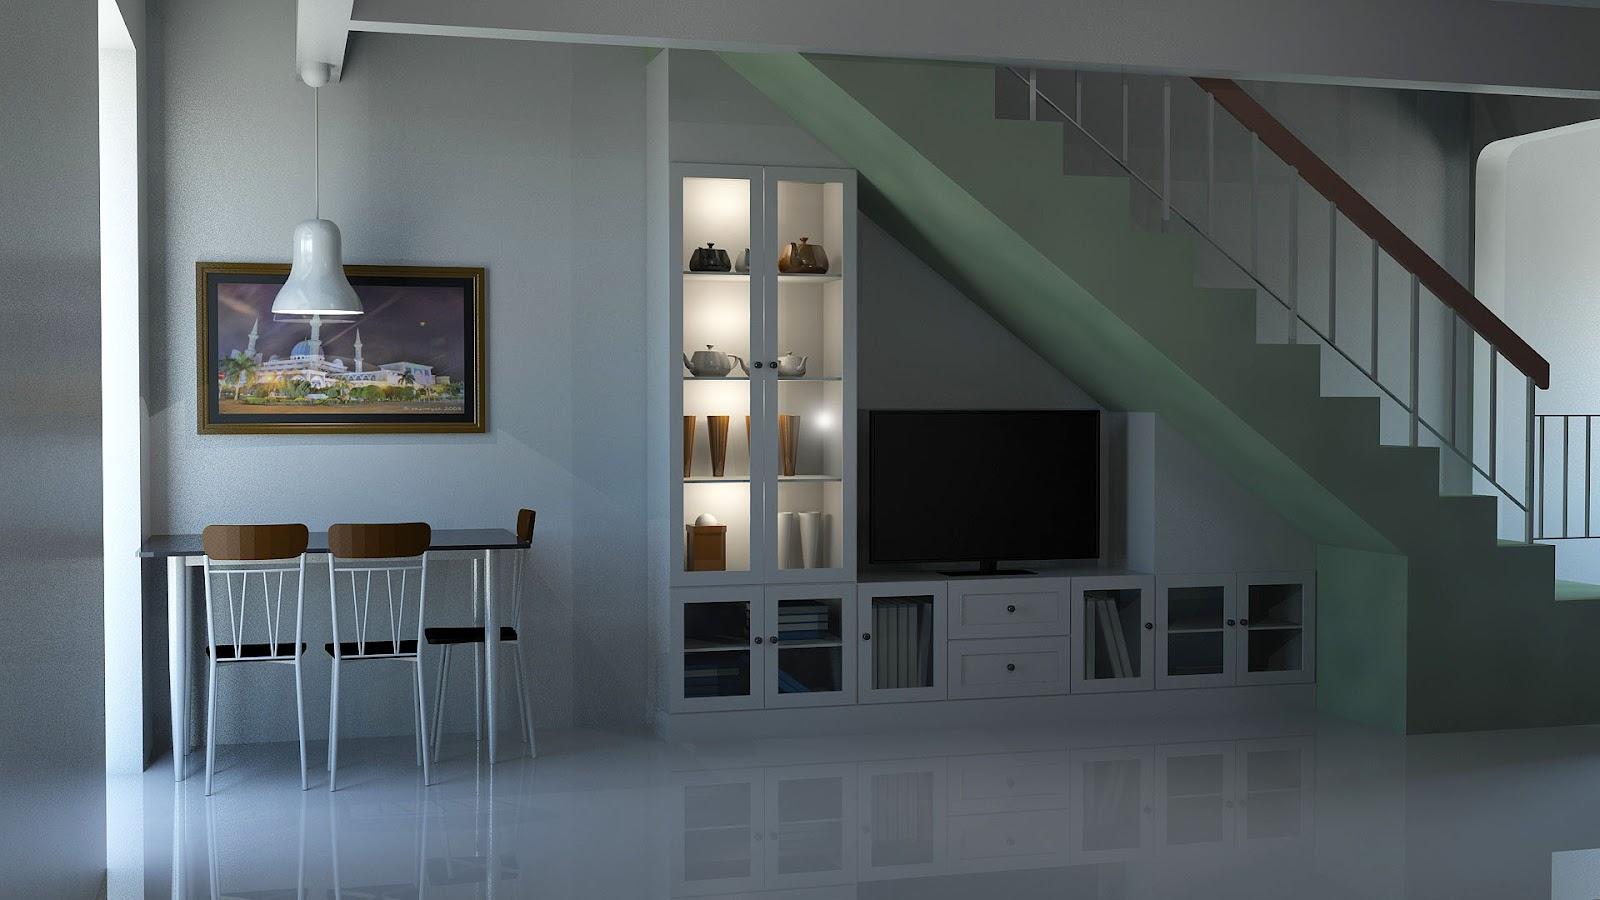 Islamic Interior / Exterior Design: Ubahsuai ruang tamu dan dapur ...